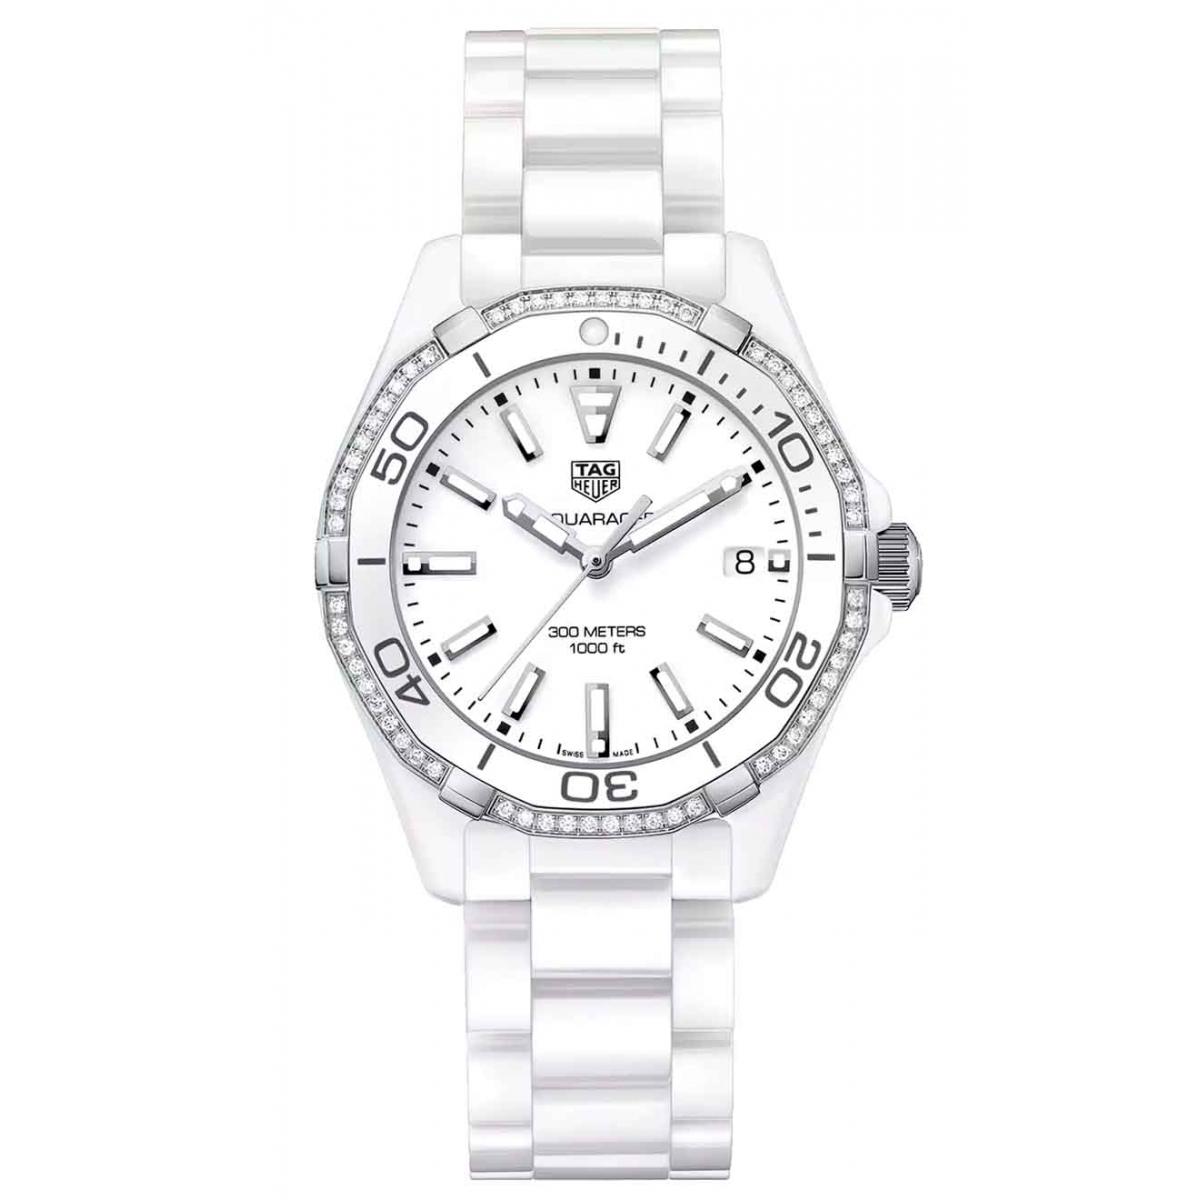 AQUARACER 300 M - ∅35 mm, Cuarzo, Diamantes, Esfera blanca Brazalete